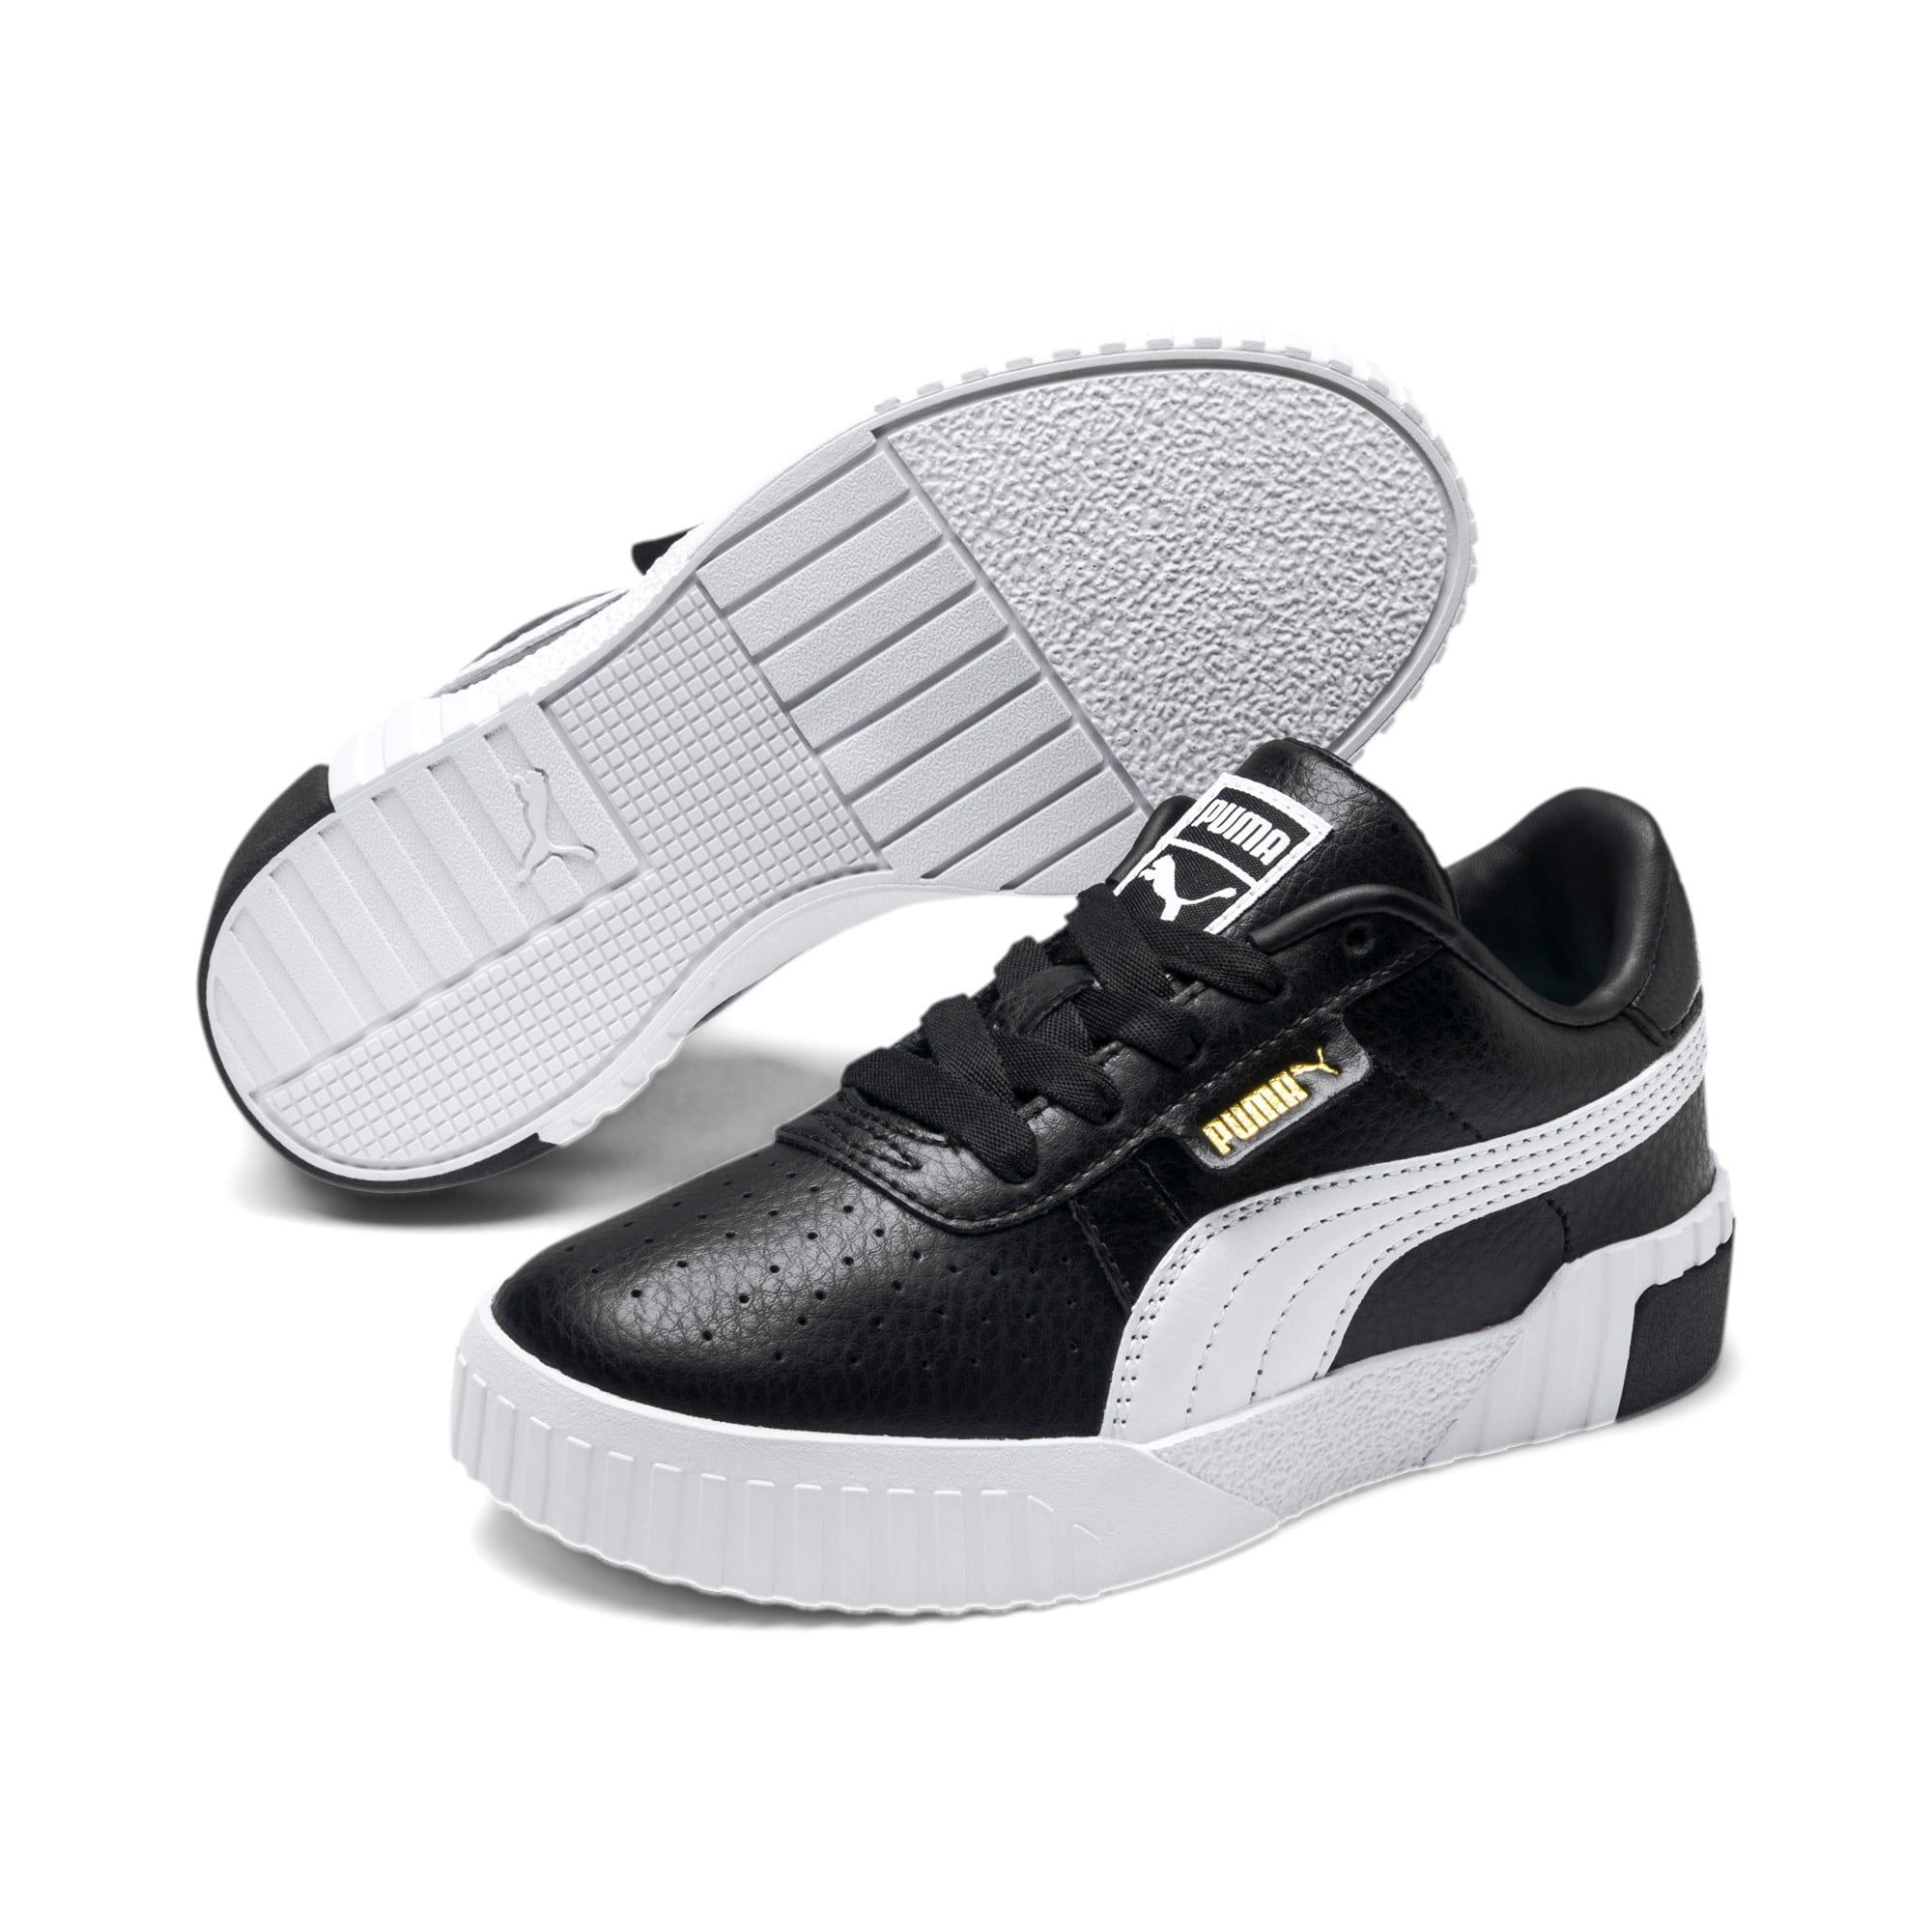 Imagen en miniatura 2 de Zapatillas Cali de niña, Puma Black-Puma Team Gold, mediana